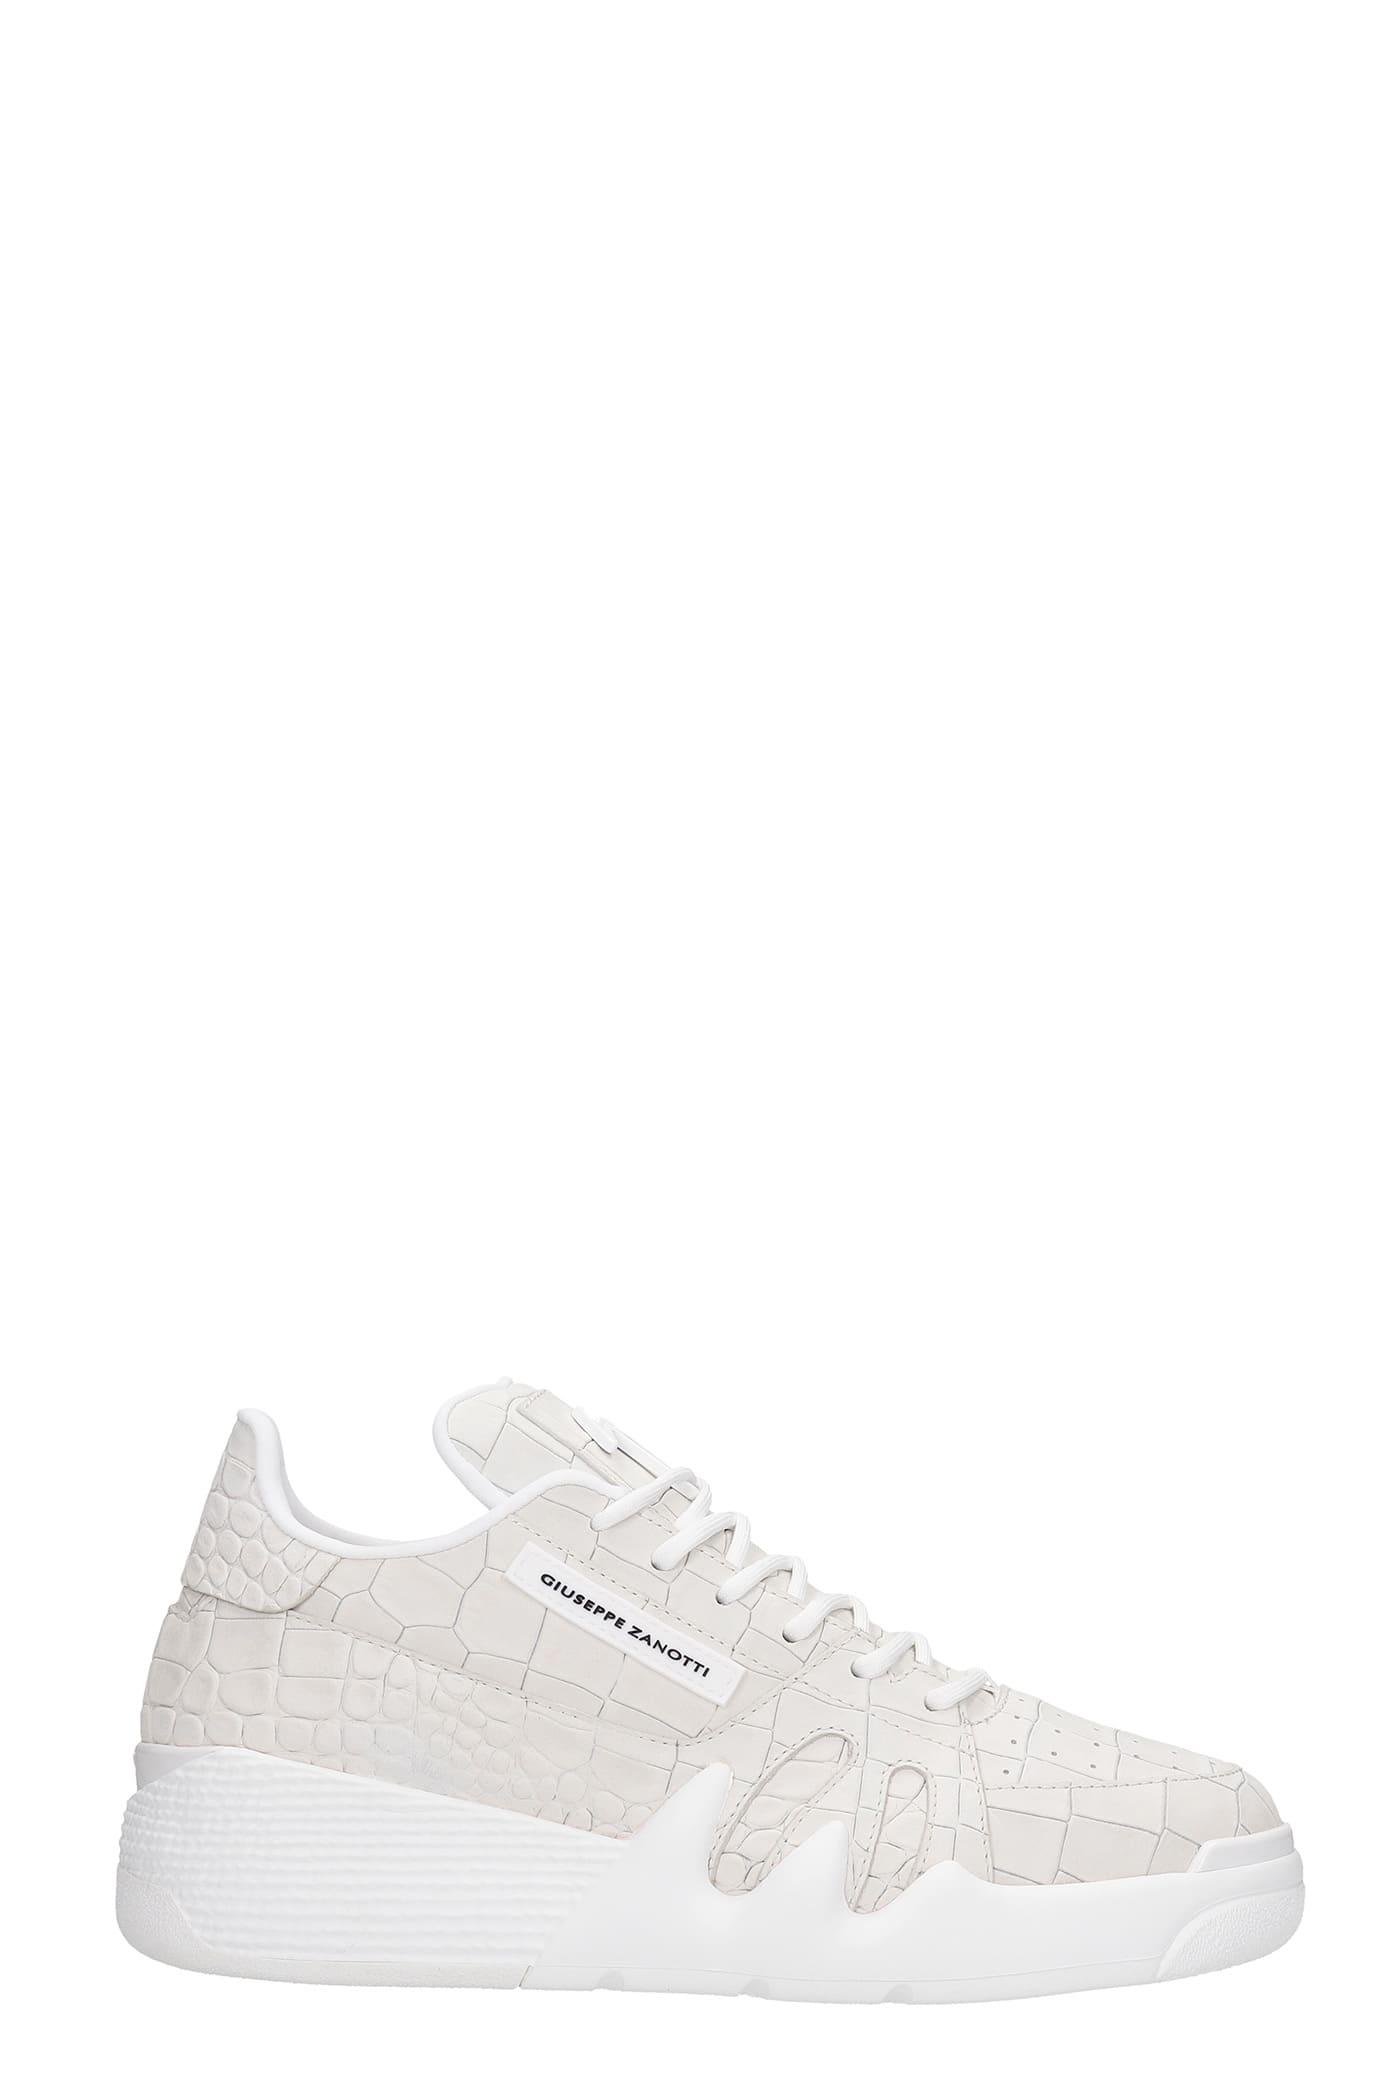 Giuseppe Zanotti Talon Sneakers In White Leather